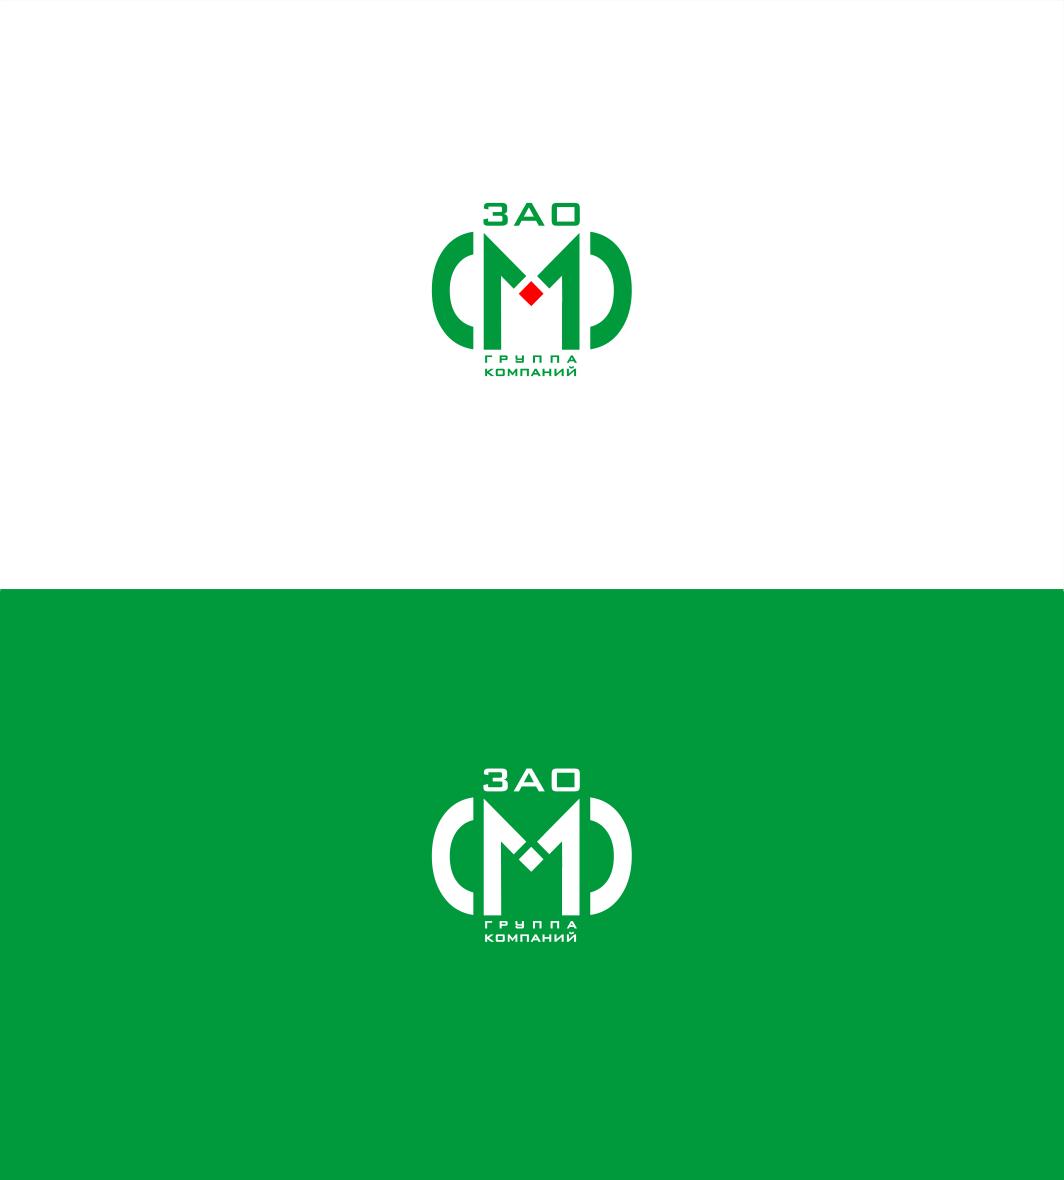 Дизайнер для разработки Логотипа для организации !СРОЧНО! фото f_0385a27bd4e70eaa.png